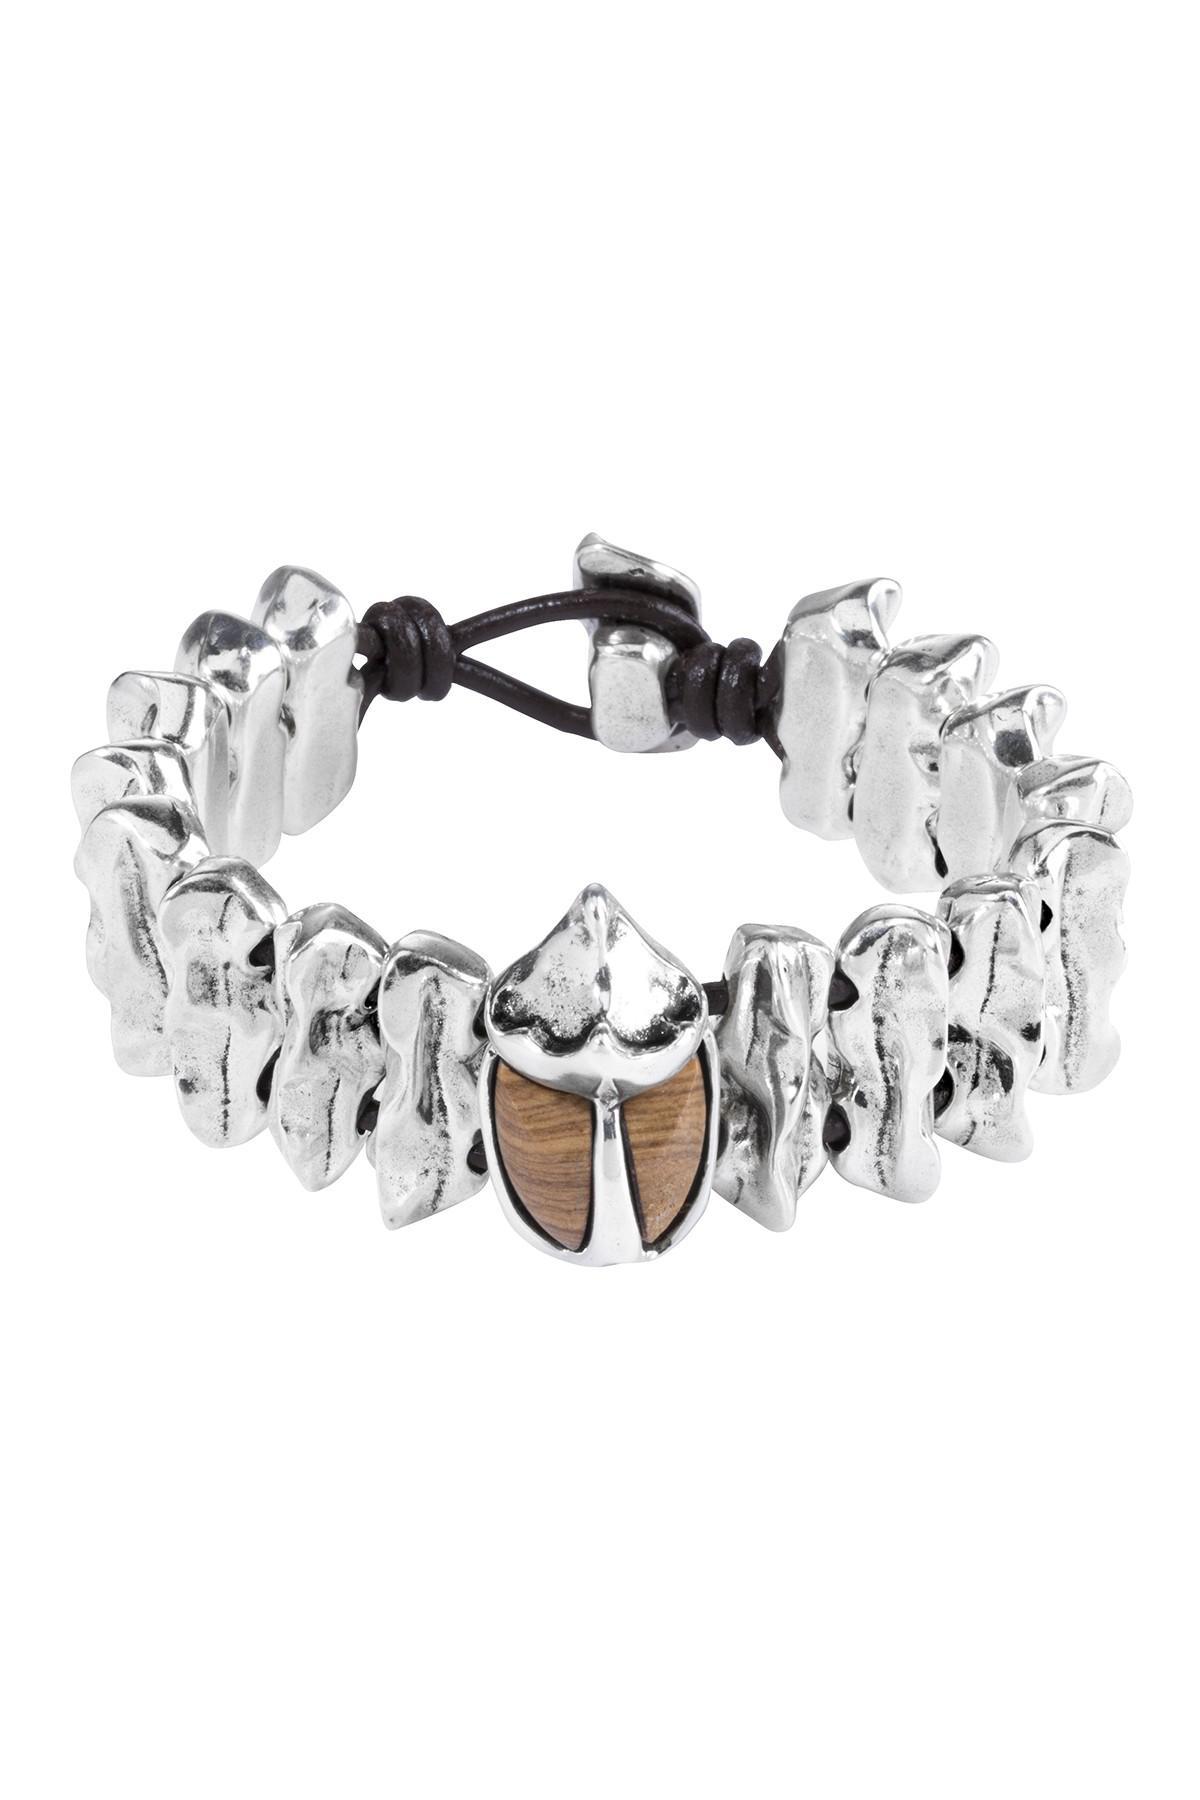 6ba53b7d67ebb Lyst - Uno De 50 Micron Silver Plated Metal Leather Bracelet in Brown